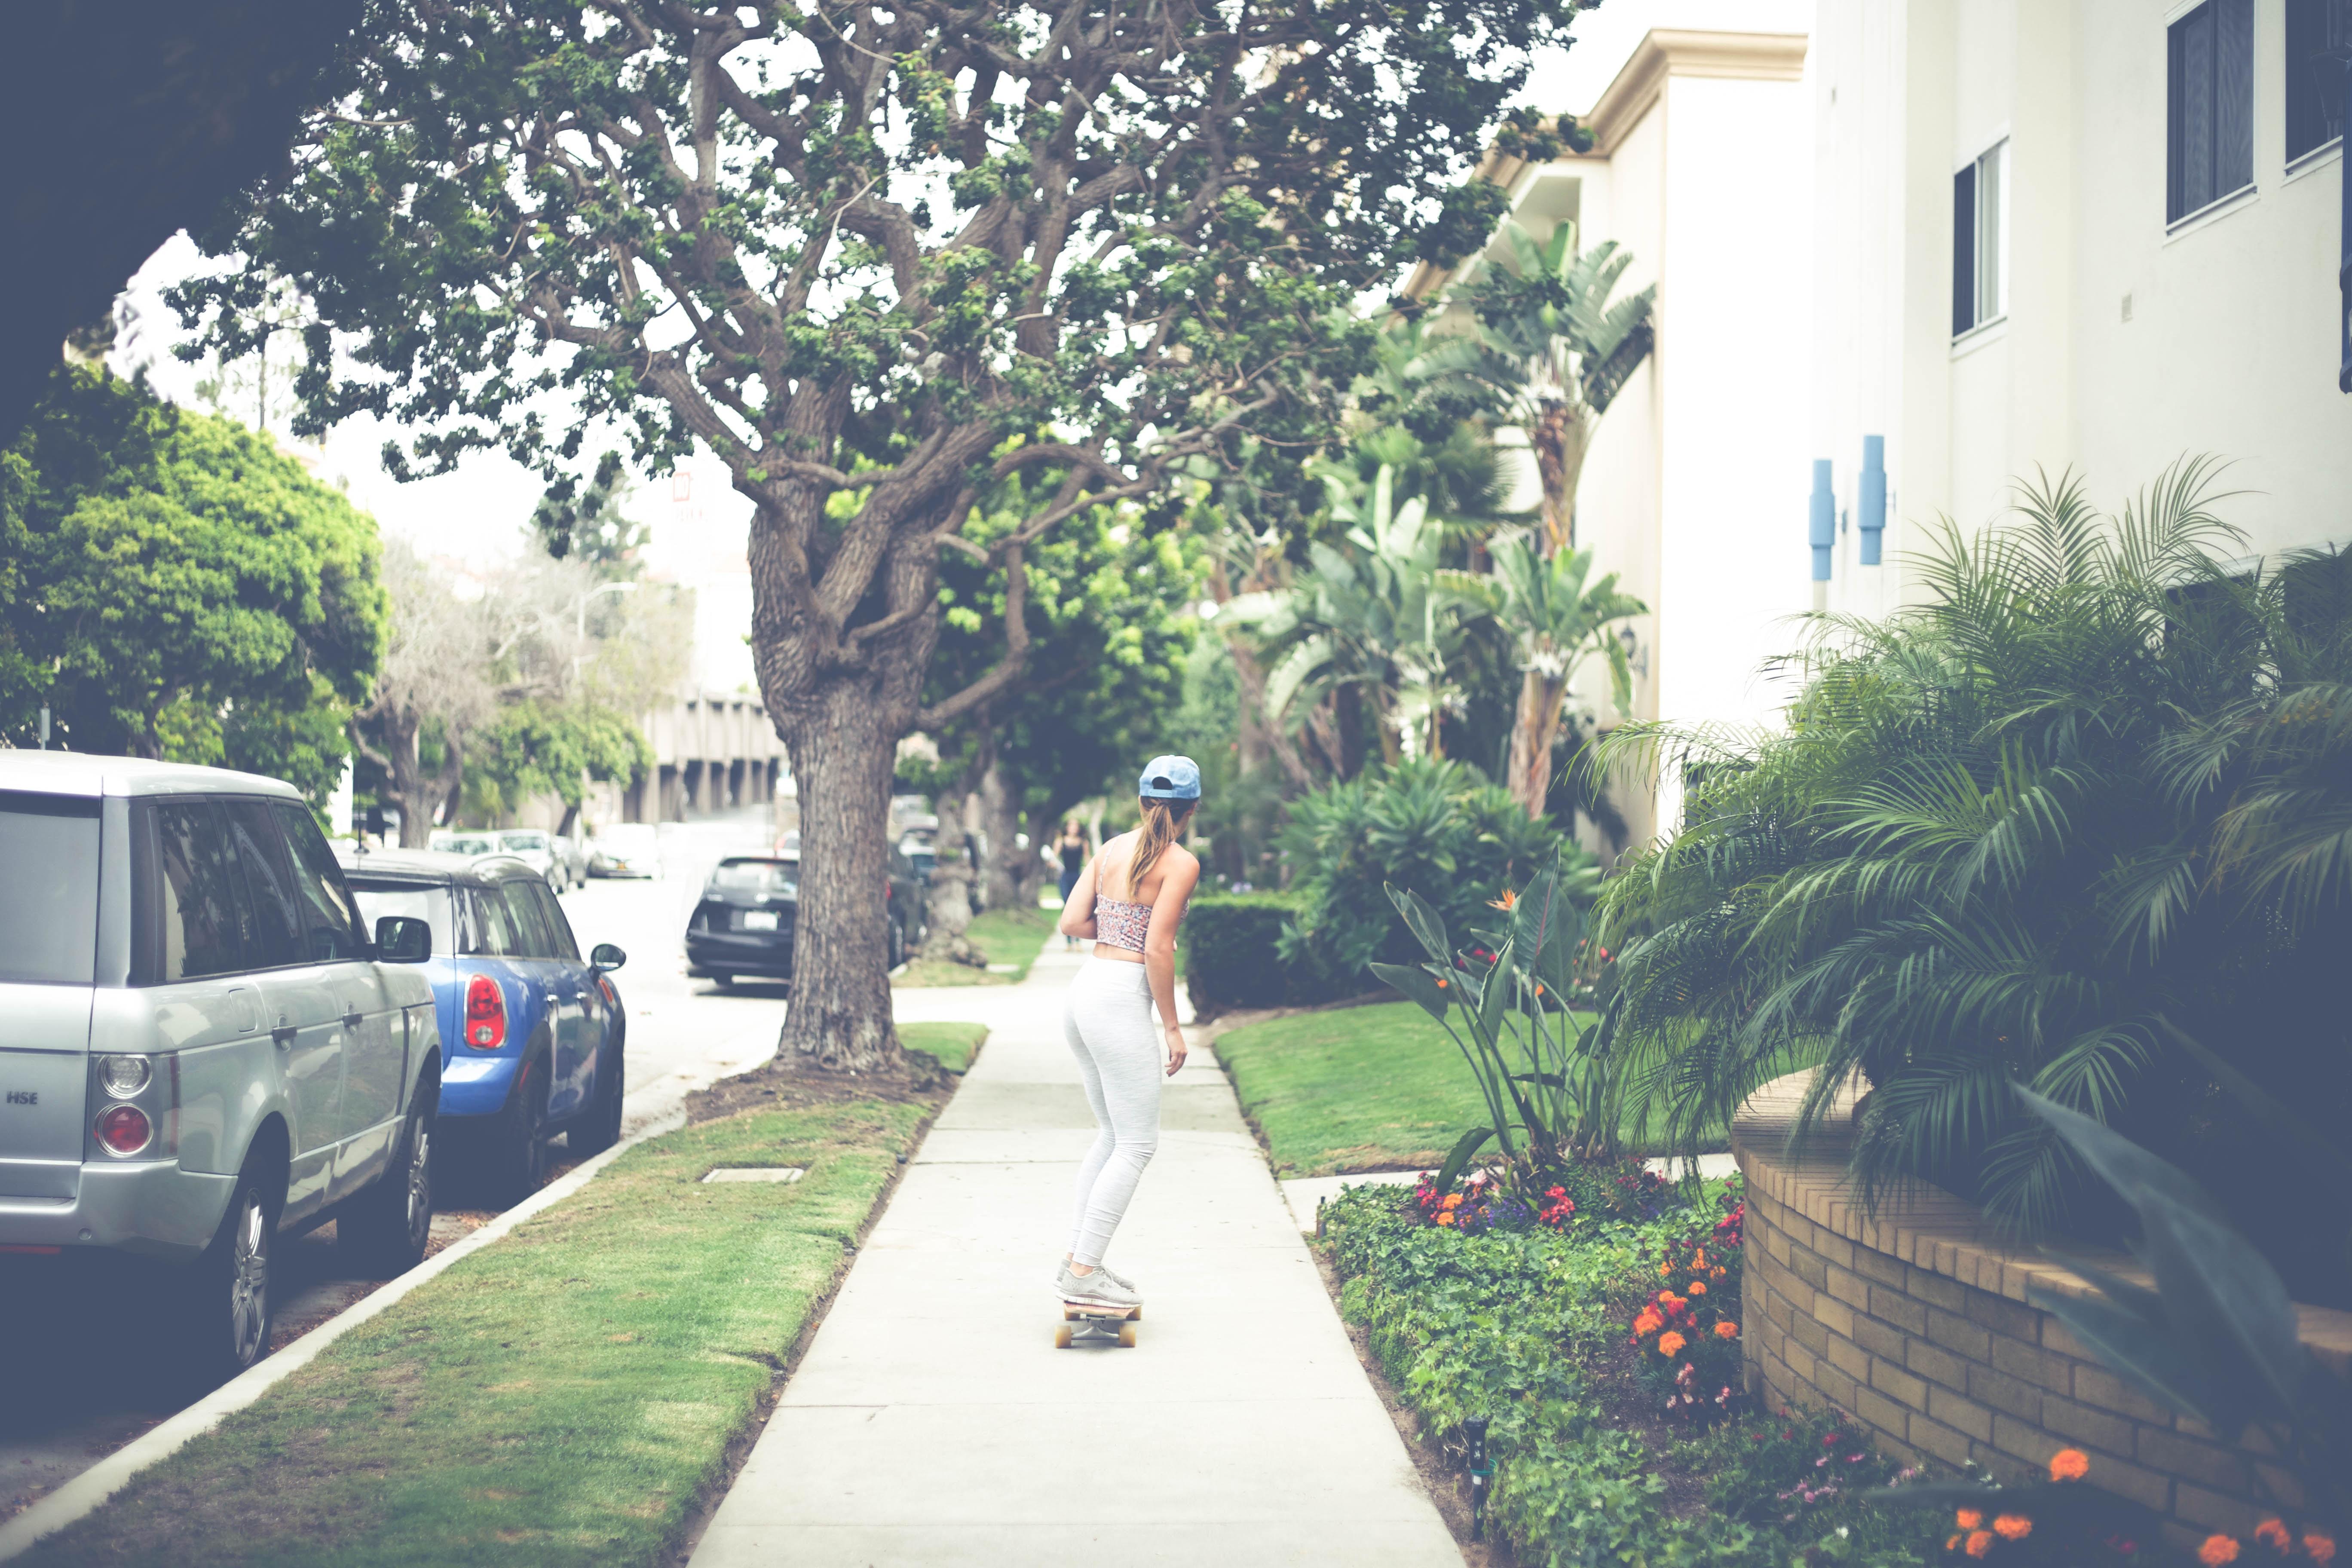 A girl skateboarding down the sidewalk in Playa del Rey